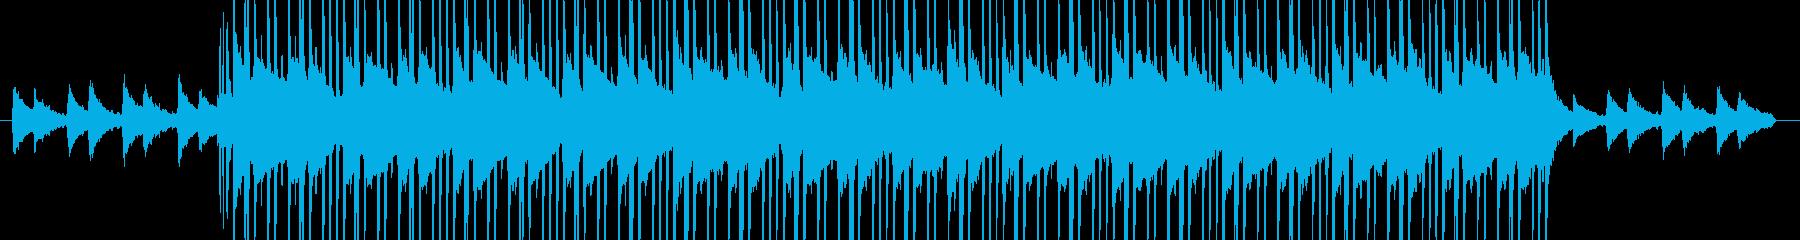 Jazzy Hiphop 1の再生済みの波形